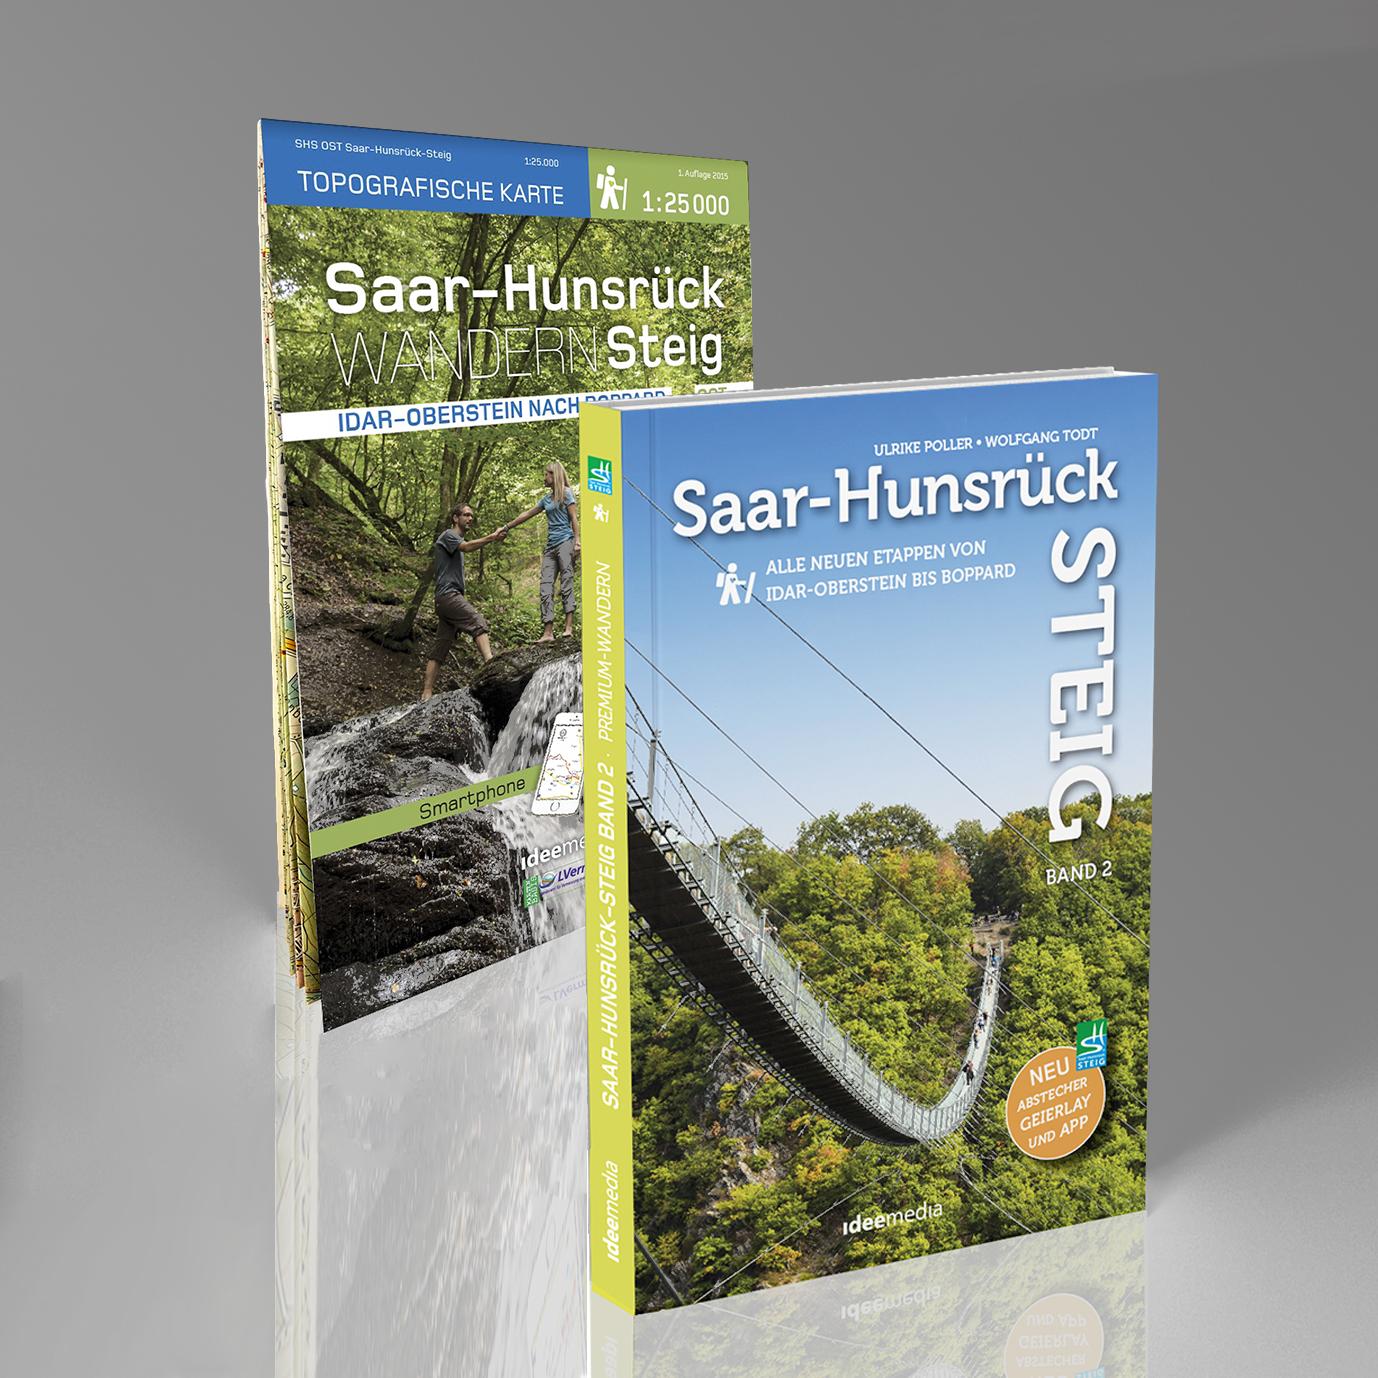 Hunsrück Hochwald Karte.Saar Hunsrück Steig Band 2 Ost Wander Set Buch Und Topografische Karte